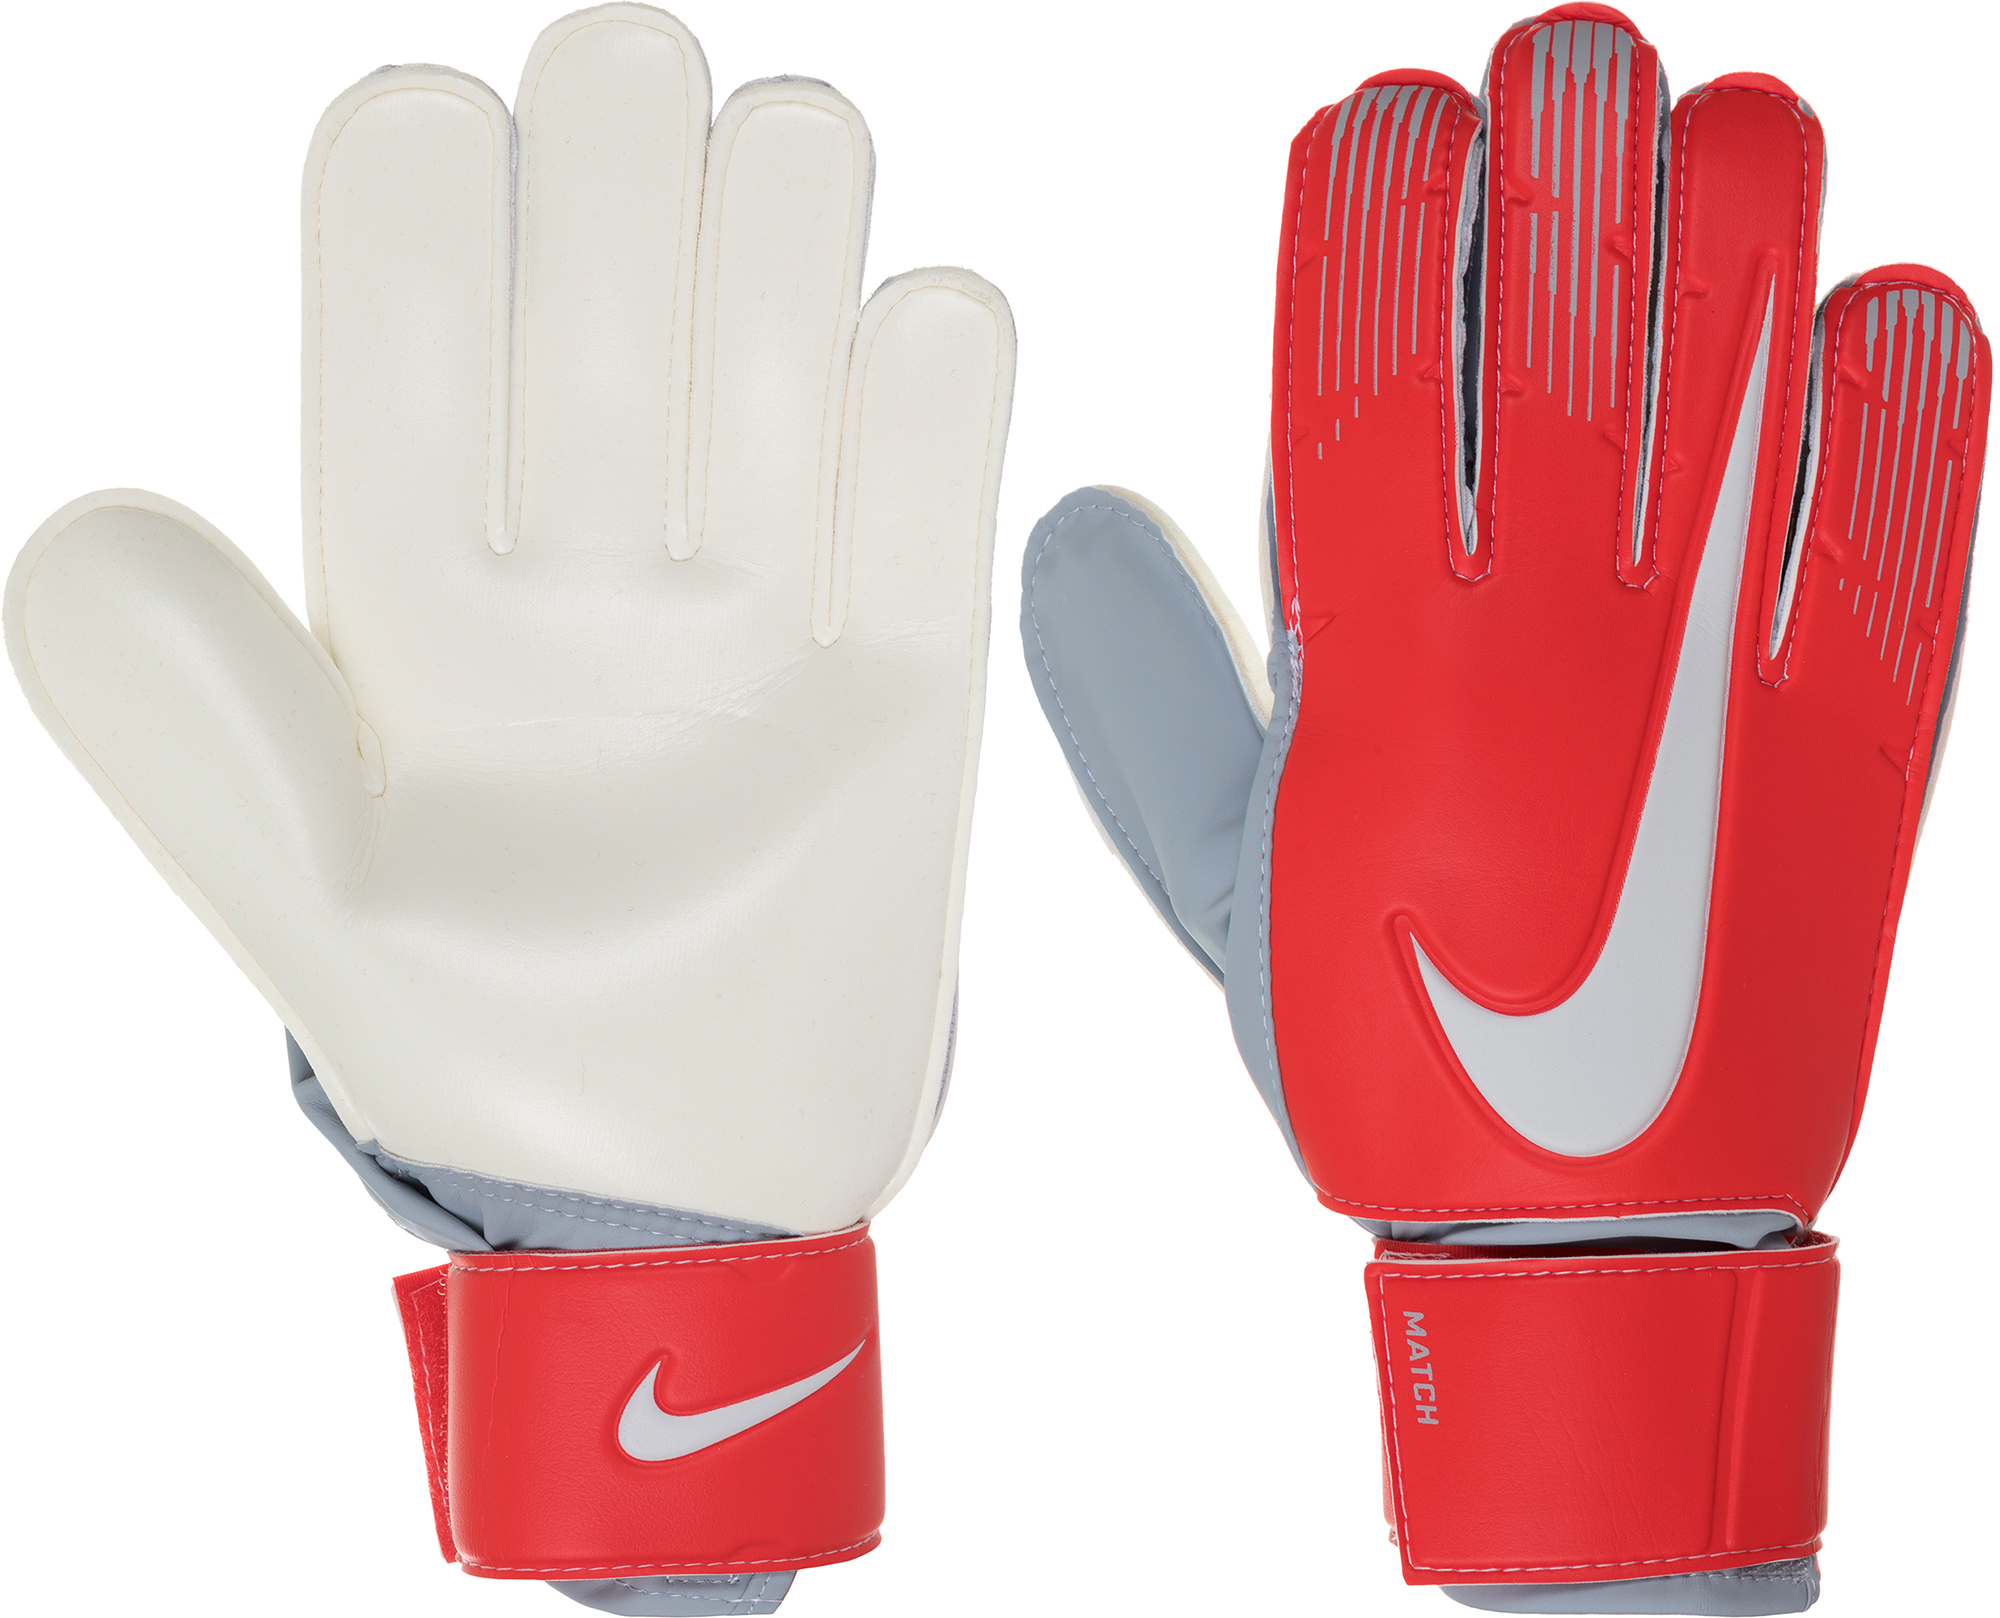 Nike Перчатки вратарские Nike Match Goalkeeper, размер 11 nike перчатки женские nike размер s